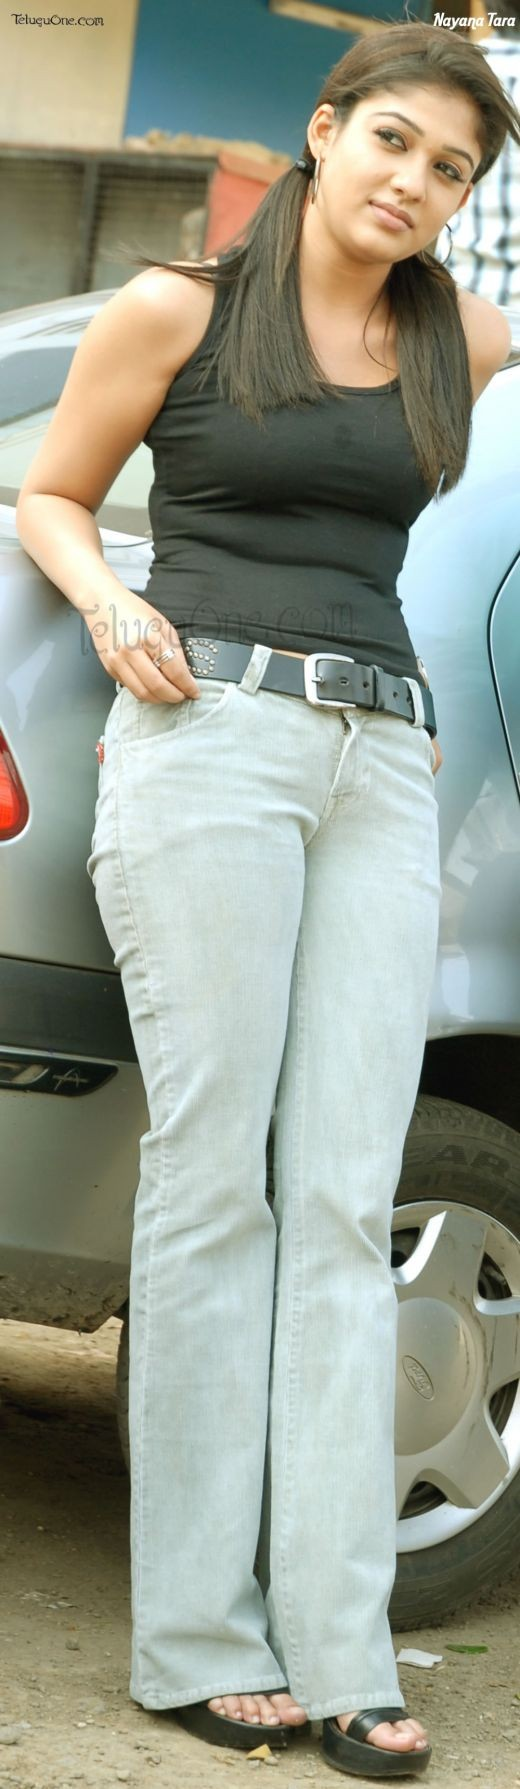 Tight jeans make Nayantara even more desirable